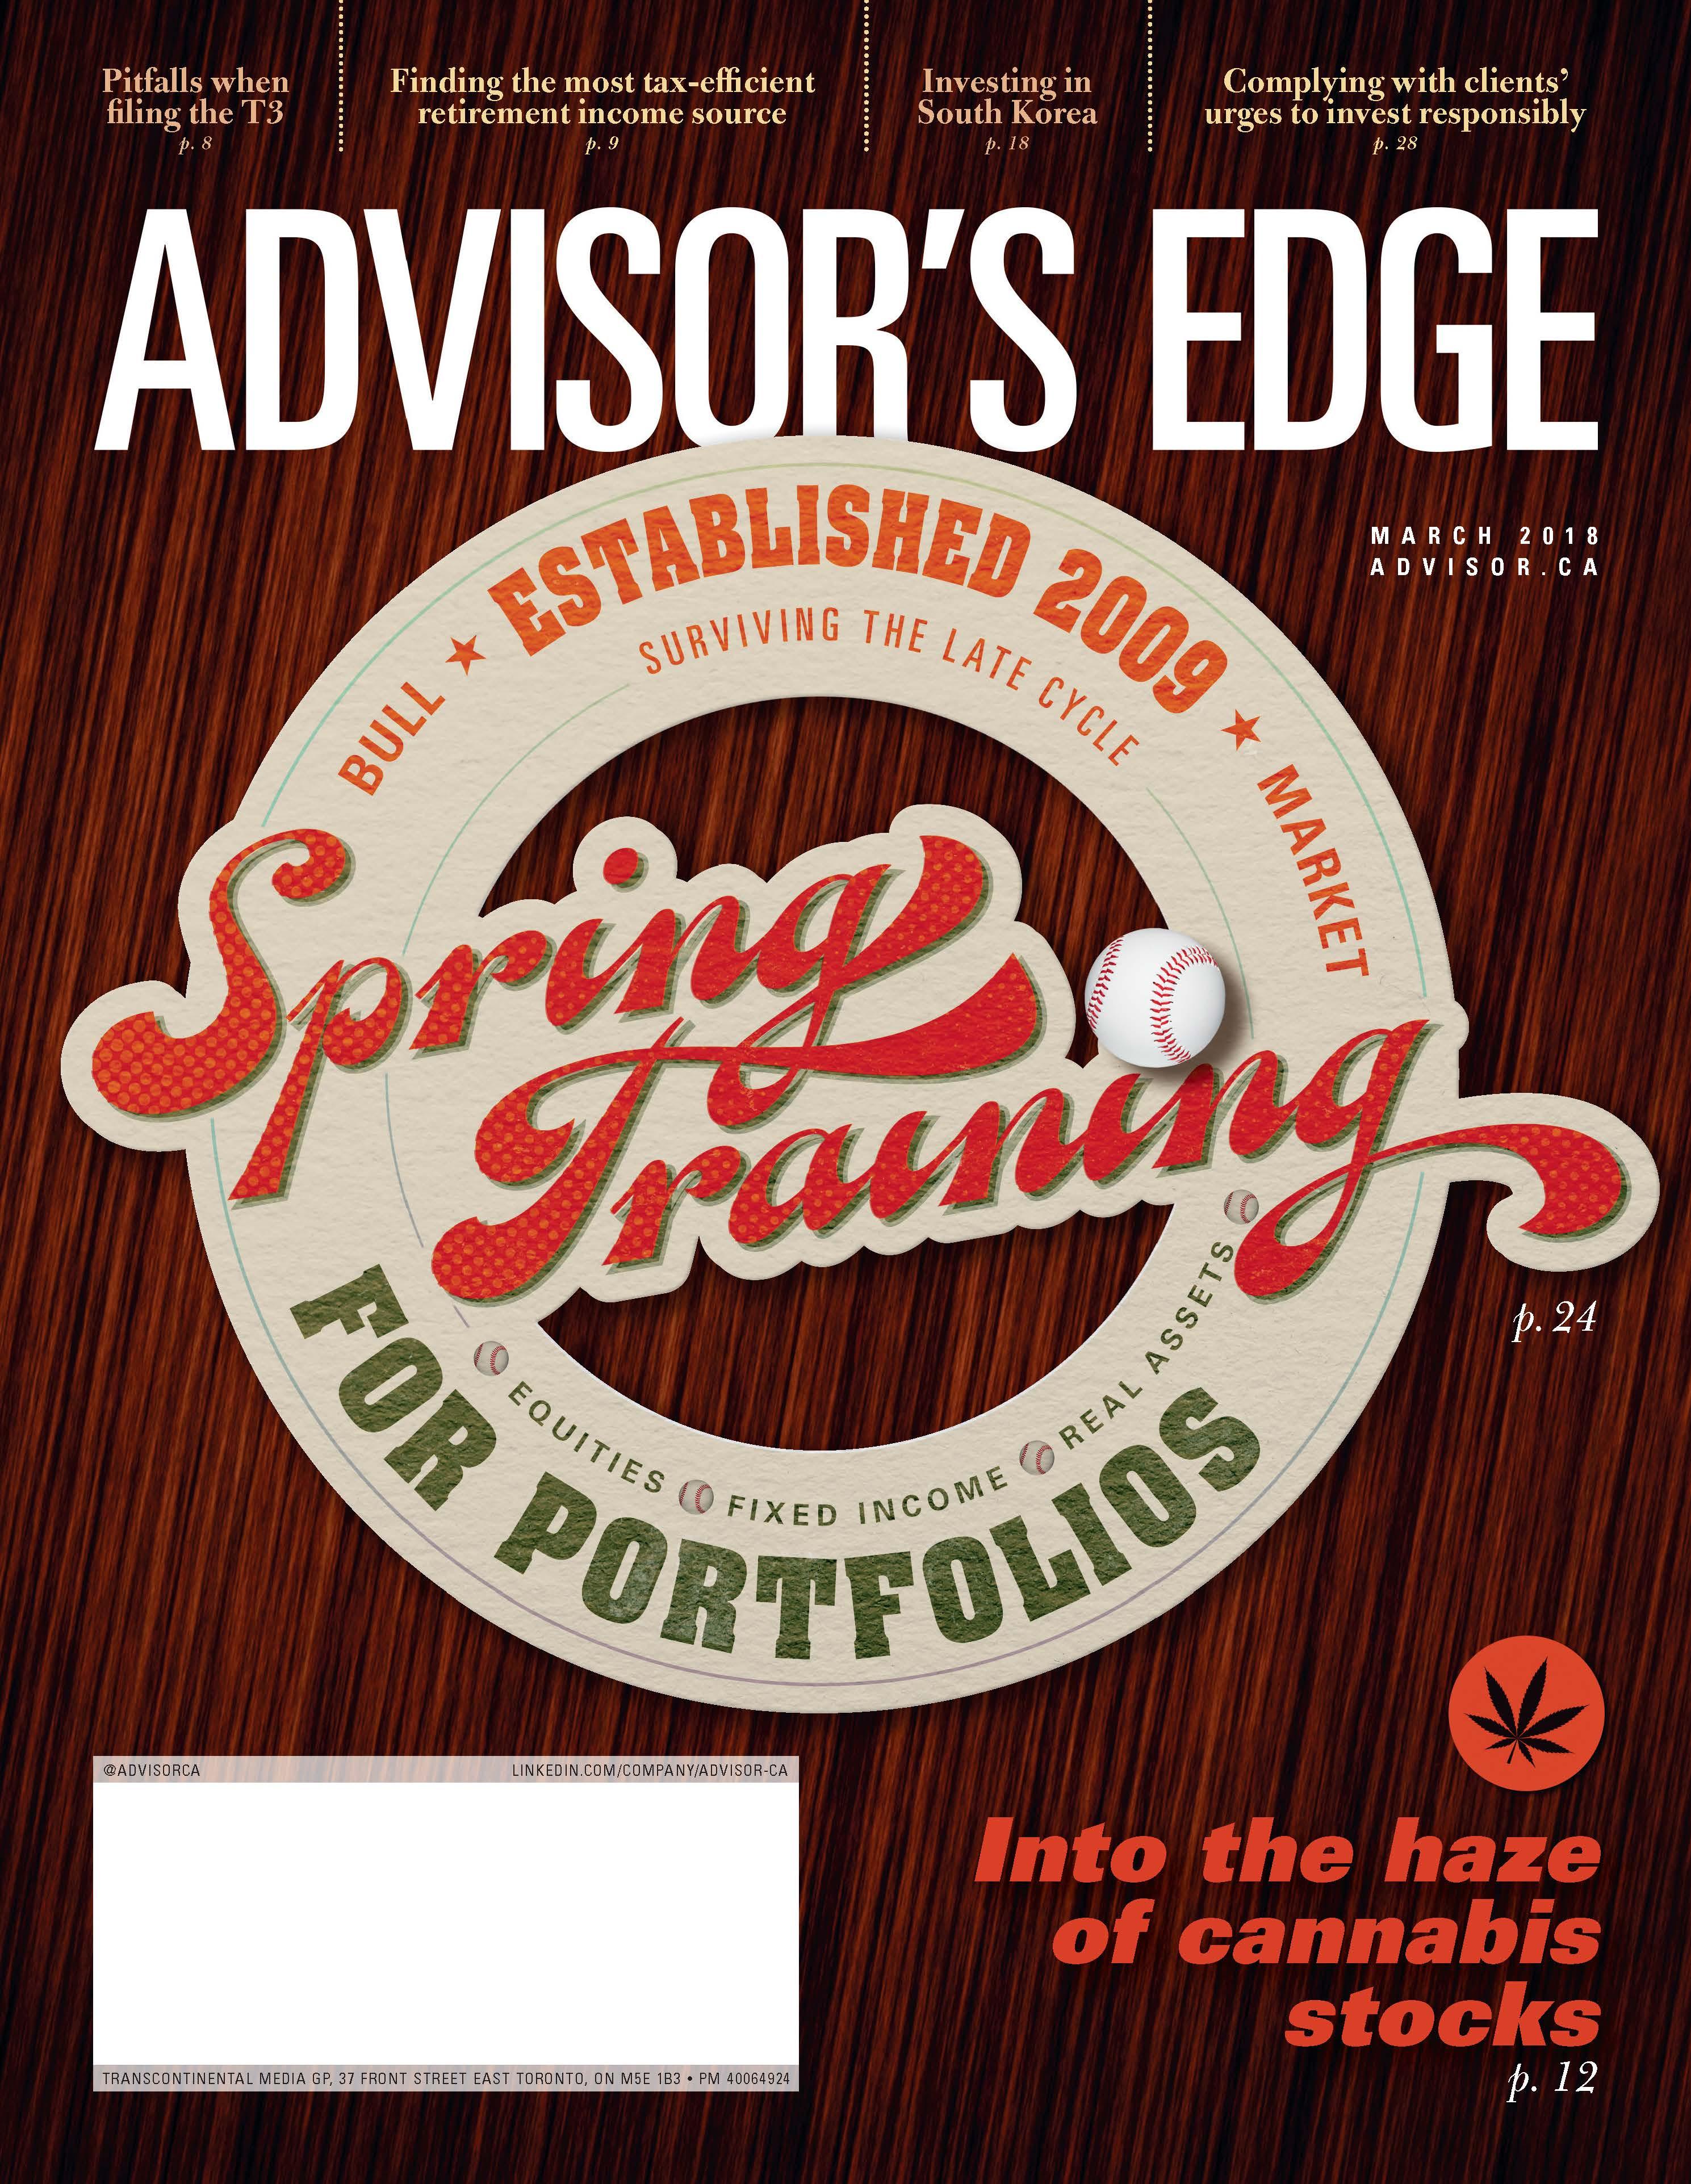 Advisor's Edge – 1 mars 2018